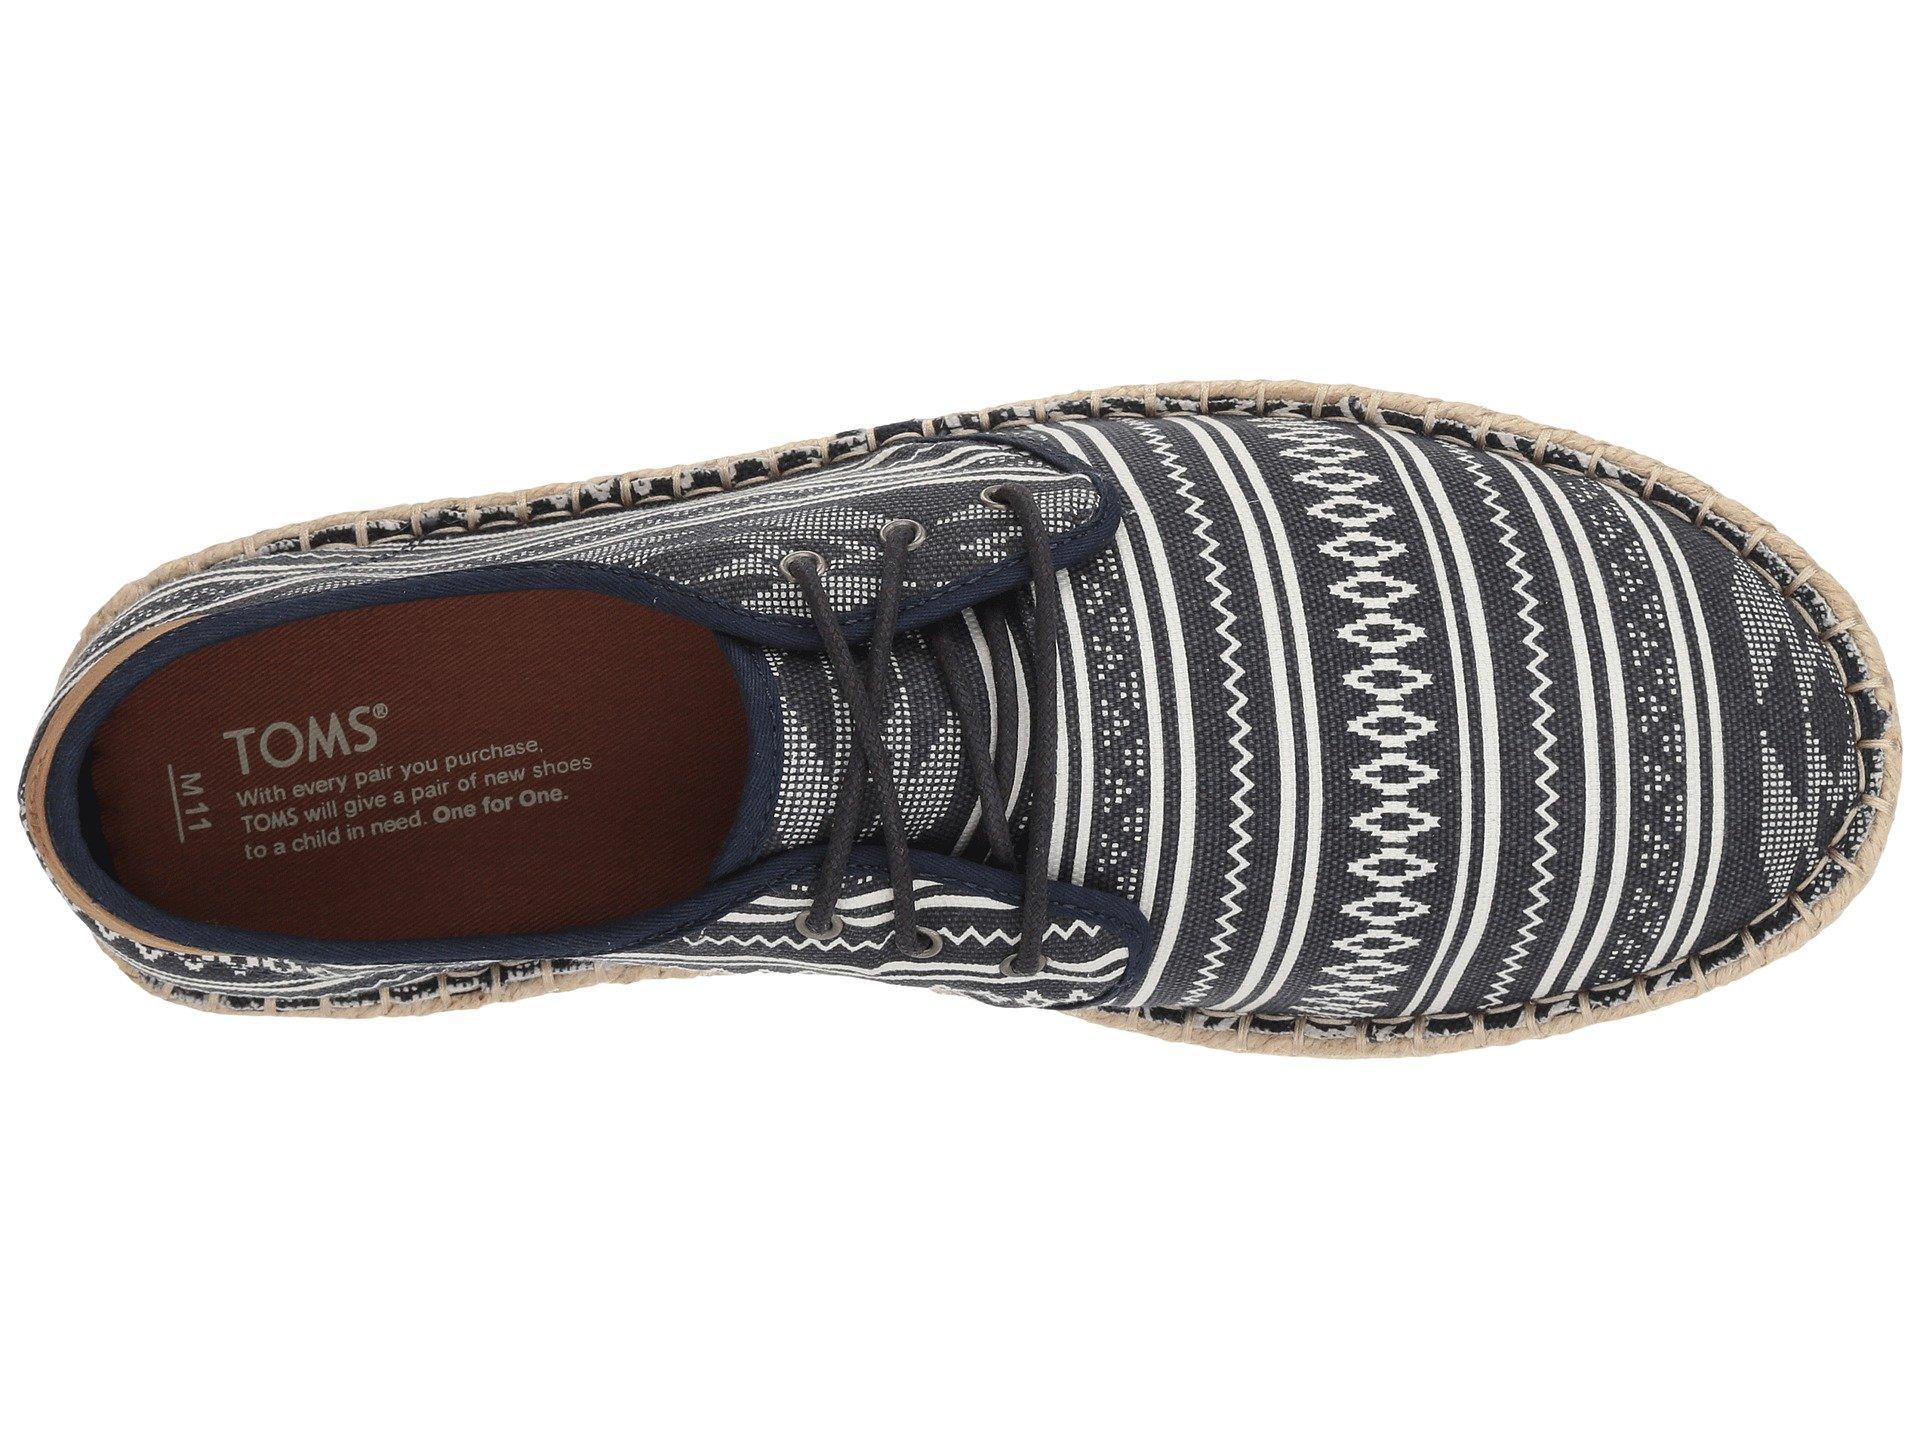 7f07cdd7459 Lyst - TOMS Navy Geo Men s Diego Sneakers in Blue for Men